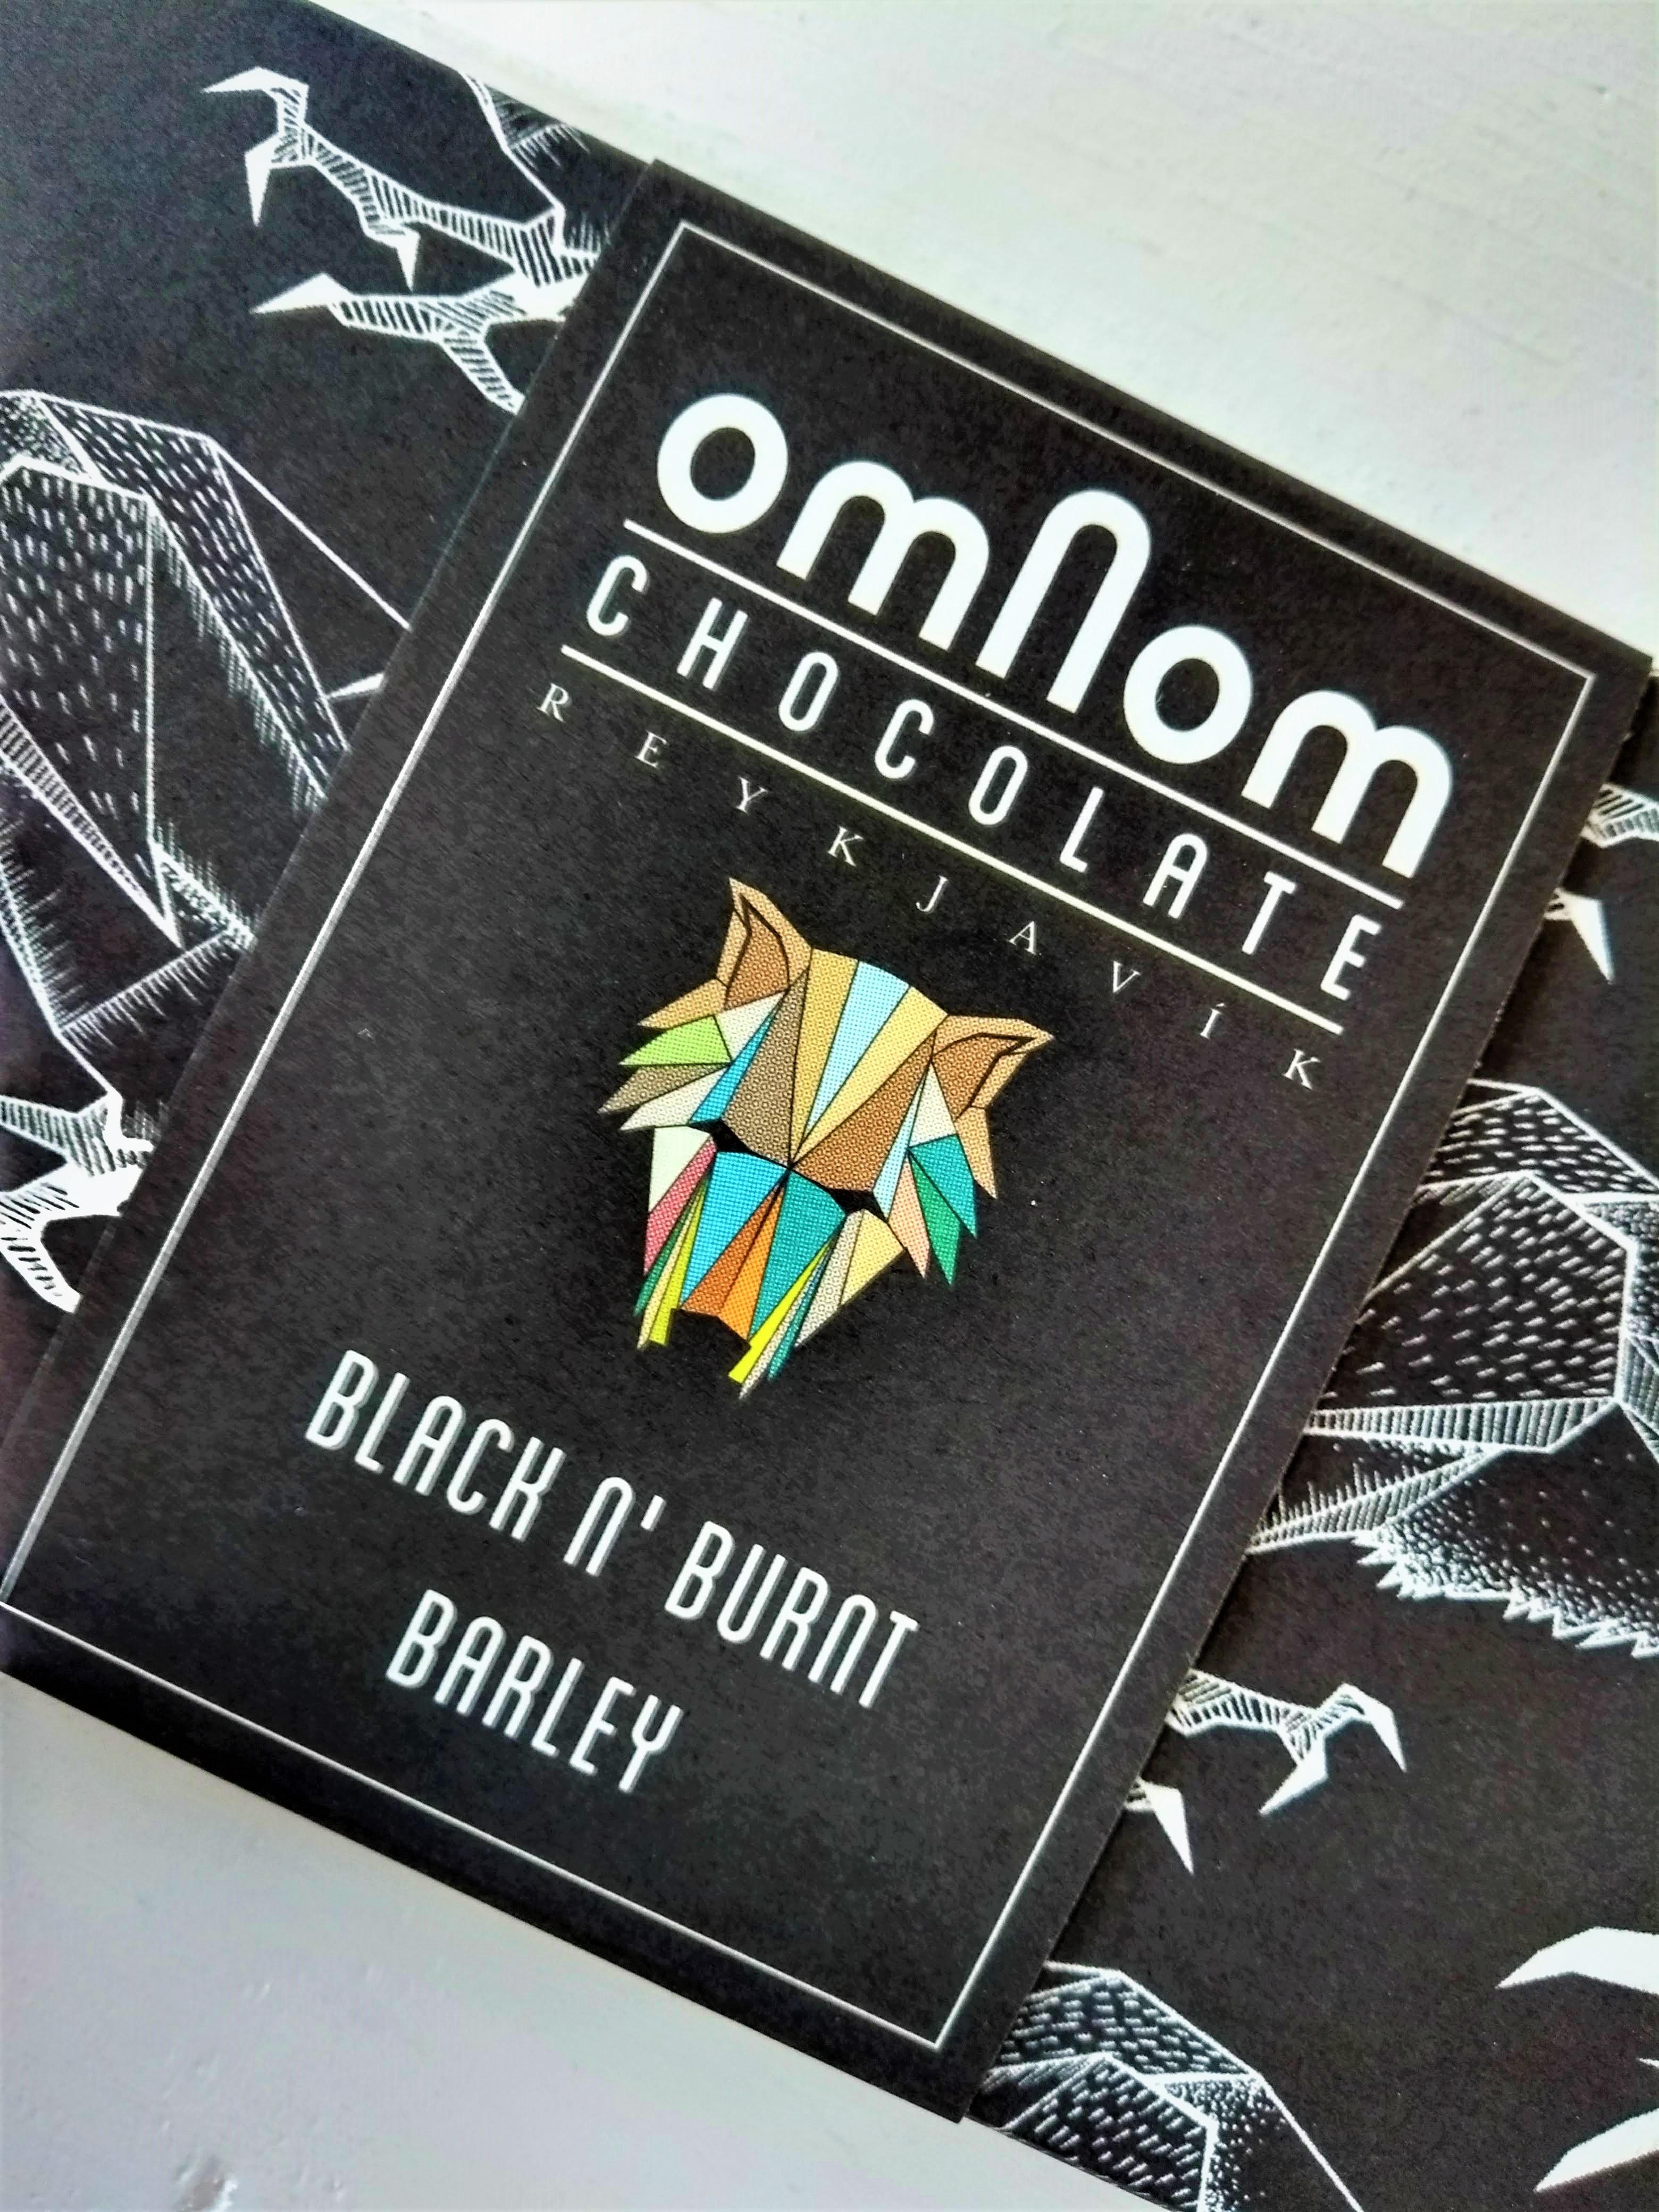 Omnom Black n' Burnt Barley: zwarte chocolade uit IJsland